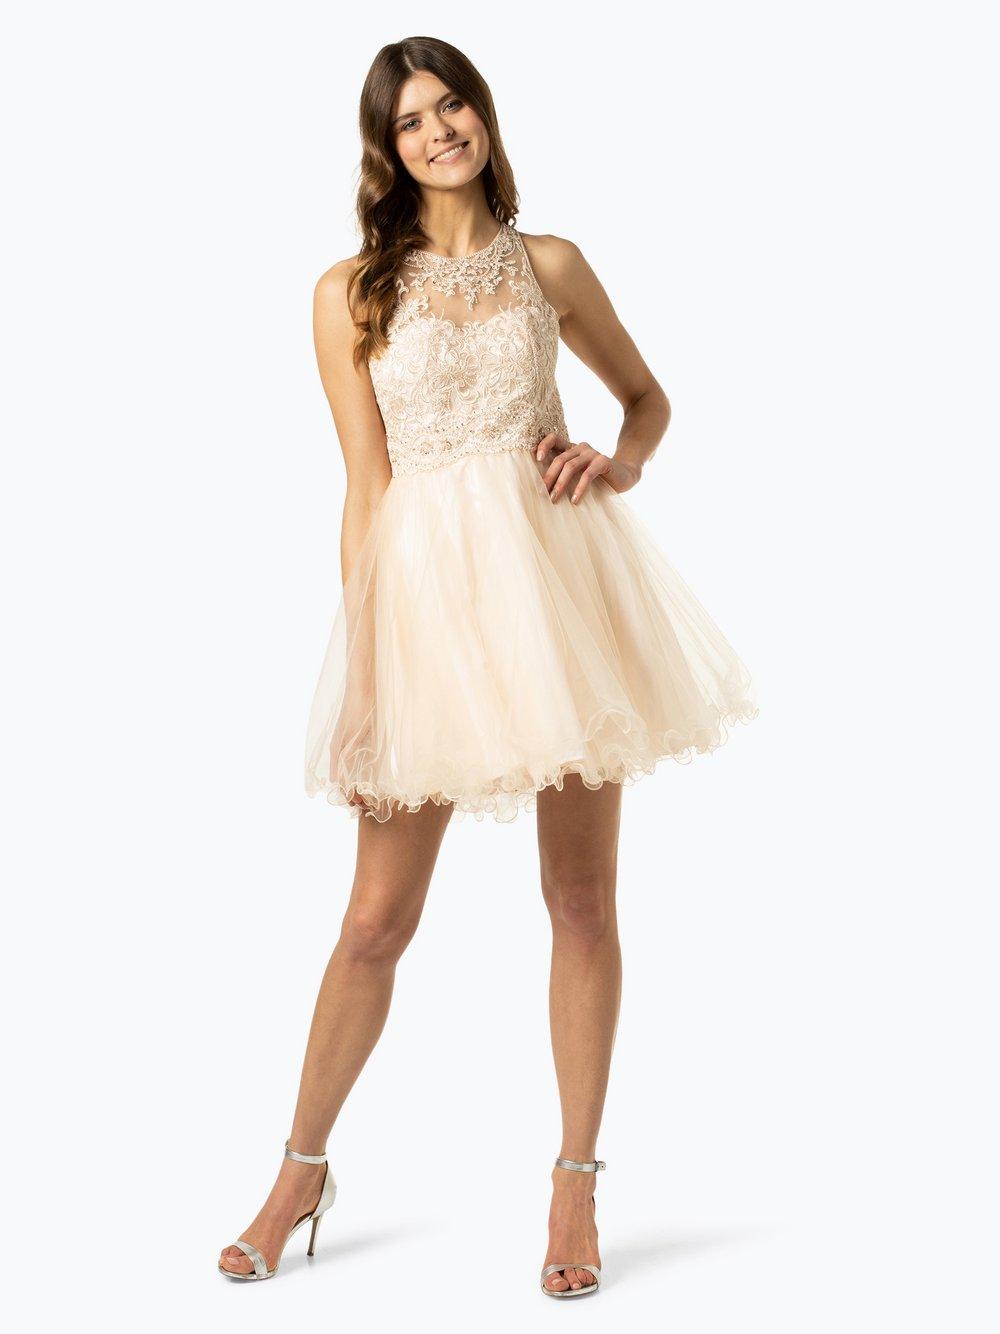 Laona – Damska sukienka wieczorowa, różowy Van Graaf 432620-0002-00380